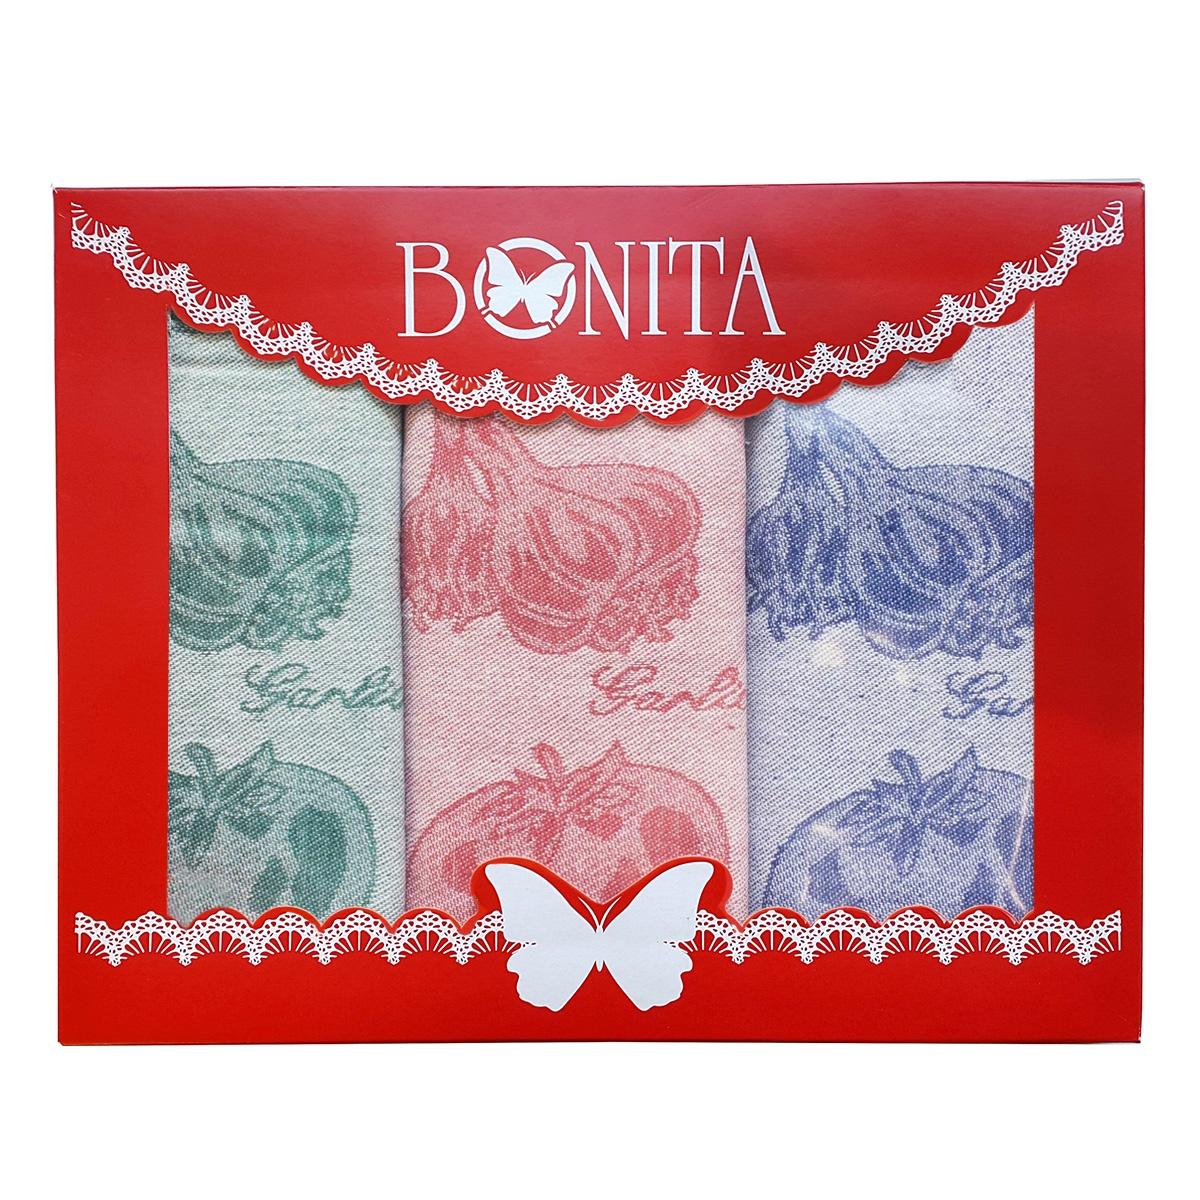 цена на Подарочный набор из полотенец Bonita Помидор, базилик, чеснок, 1010215434, 50х70 см, 3 шт